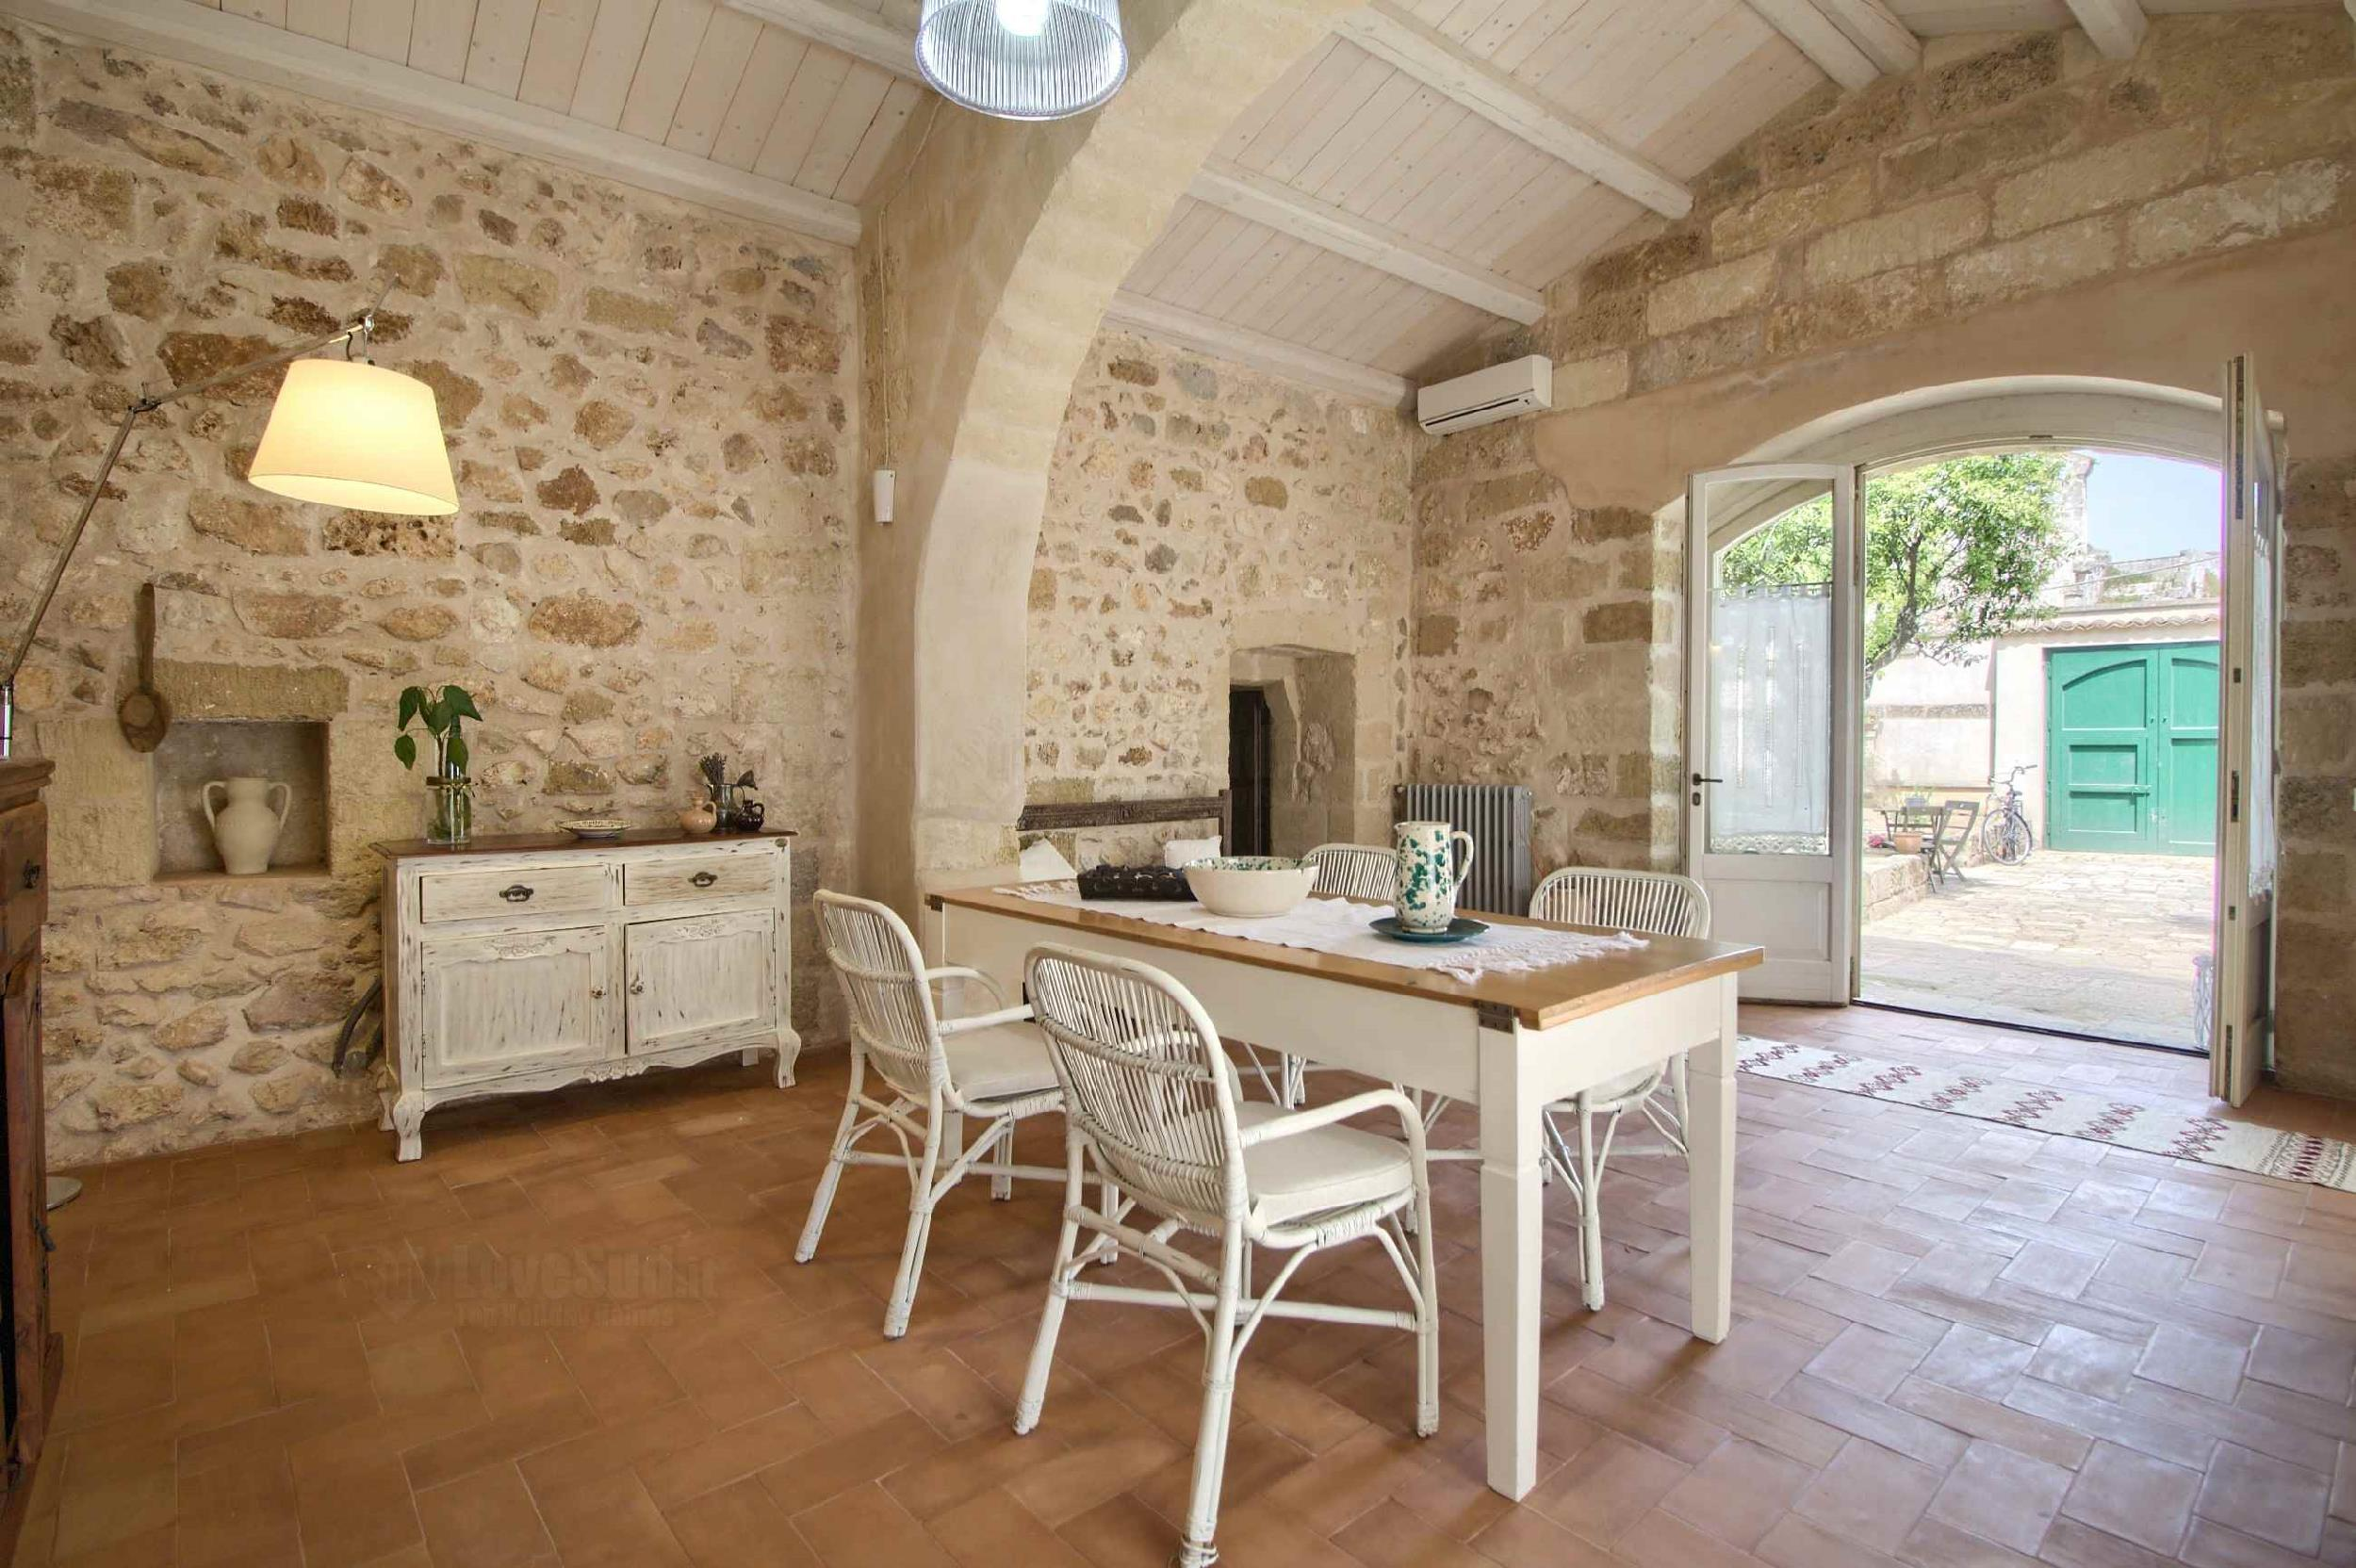 Deluxe Stone Room - B&B A Palazzo photo 22457687